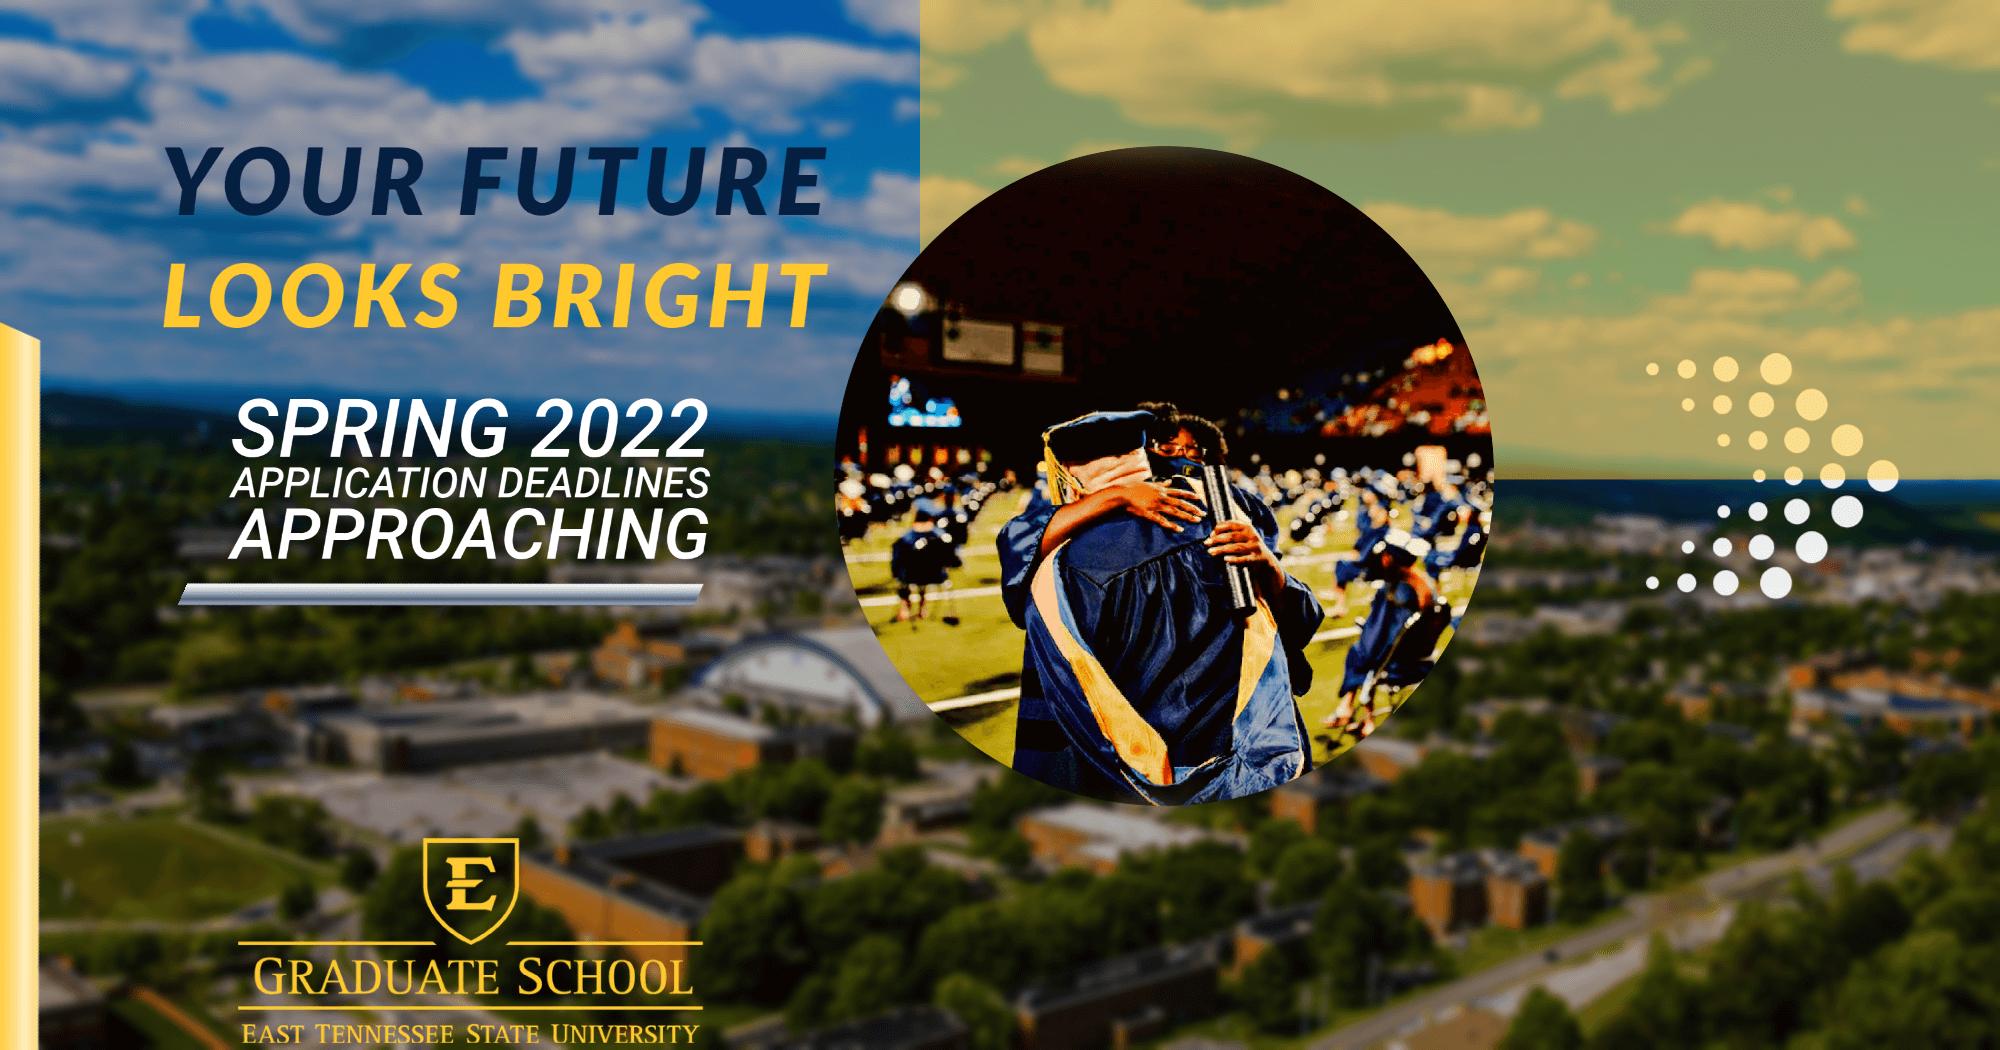 Spring 2022 Deadlines